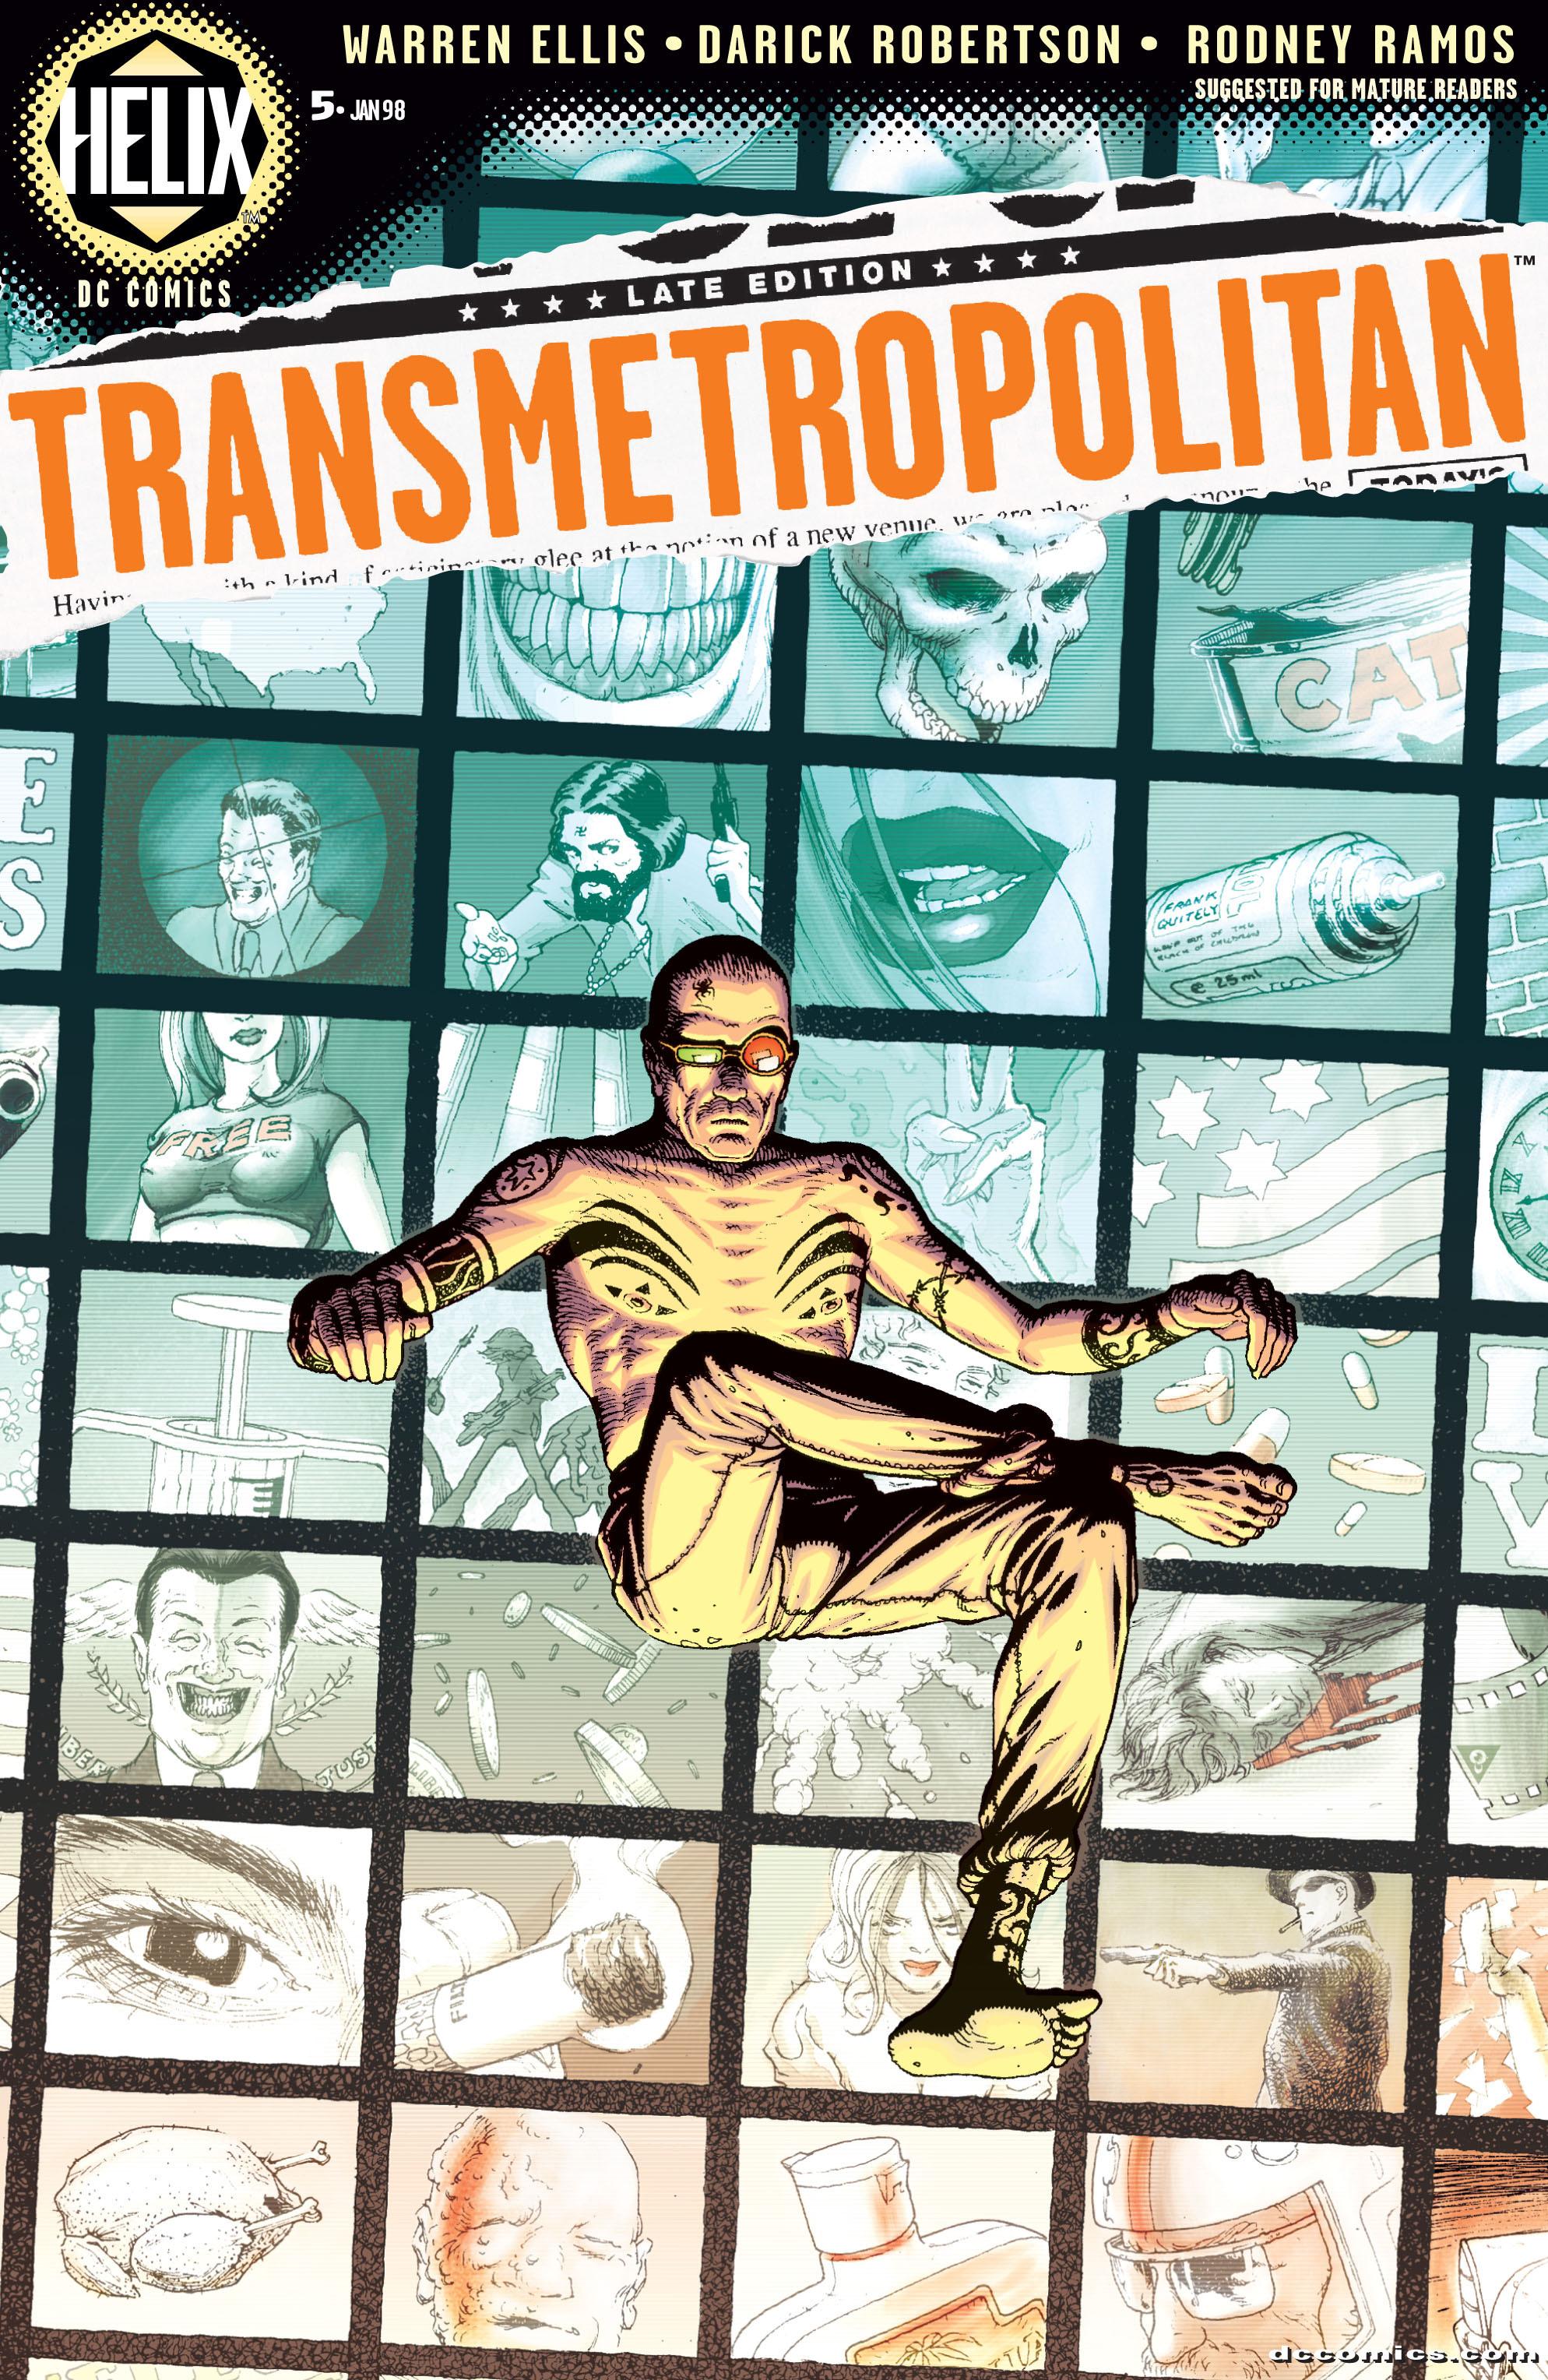 Read online Transmetropolitan comic -  Issue #5 - 1